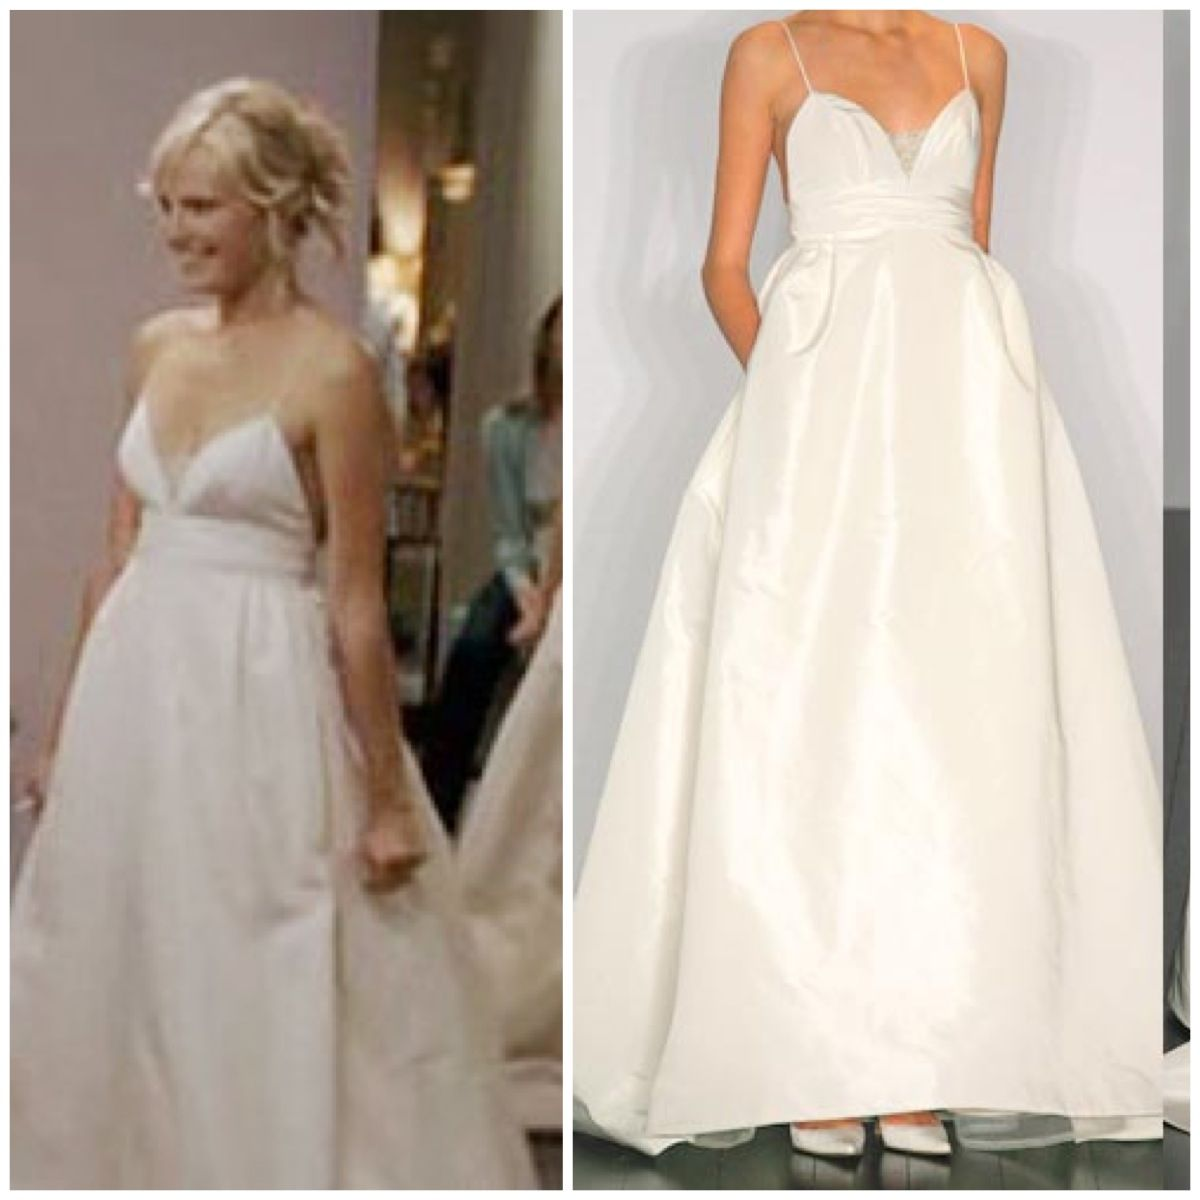 27 dresses wedding dress  wedding dress from the movie  Dresses  Dream wedding  Pinterest